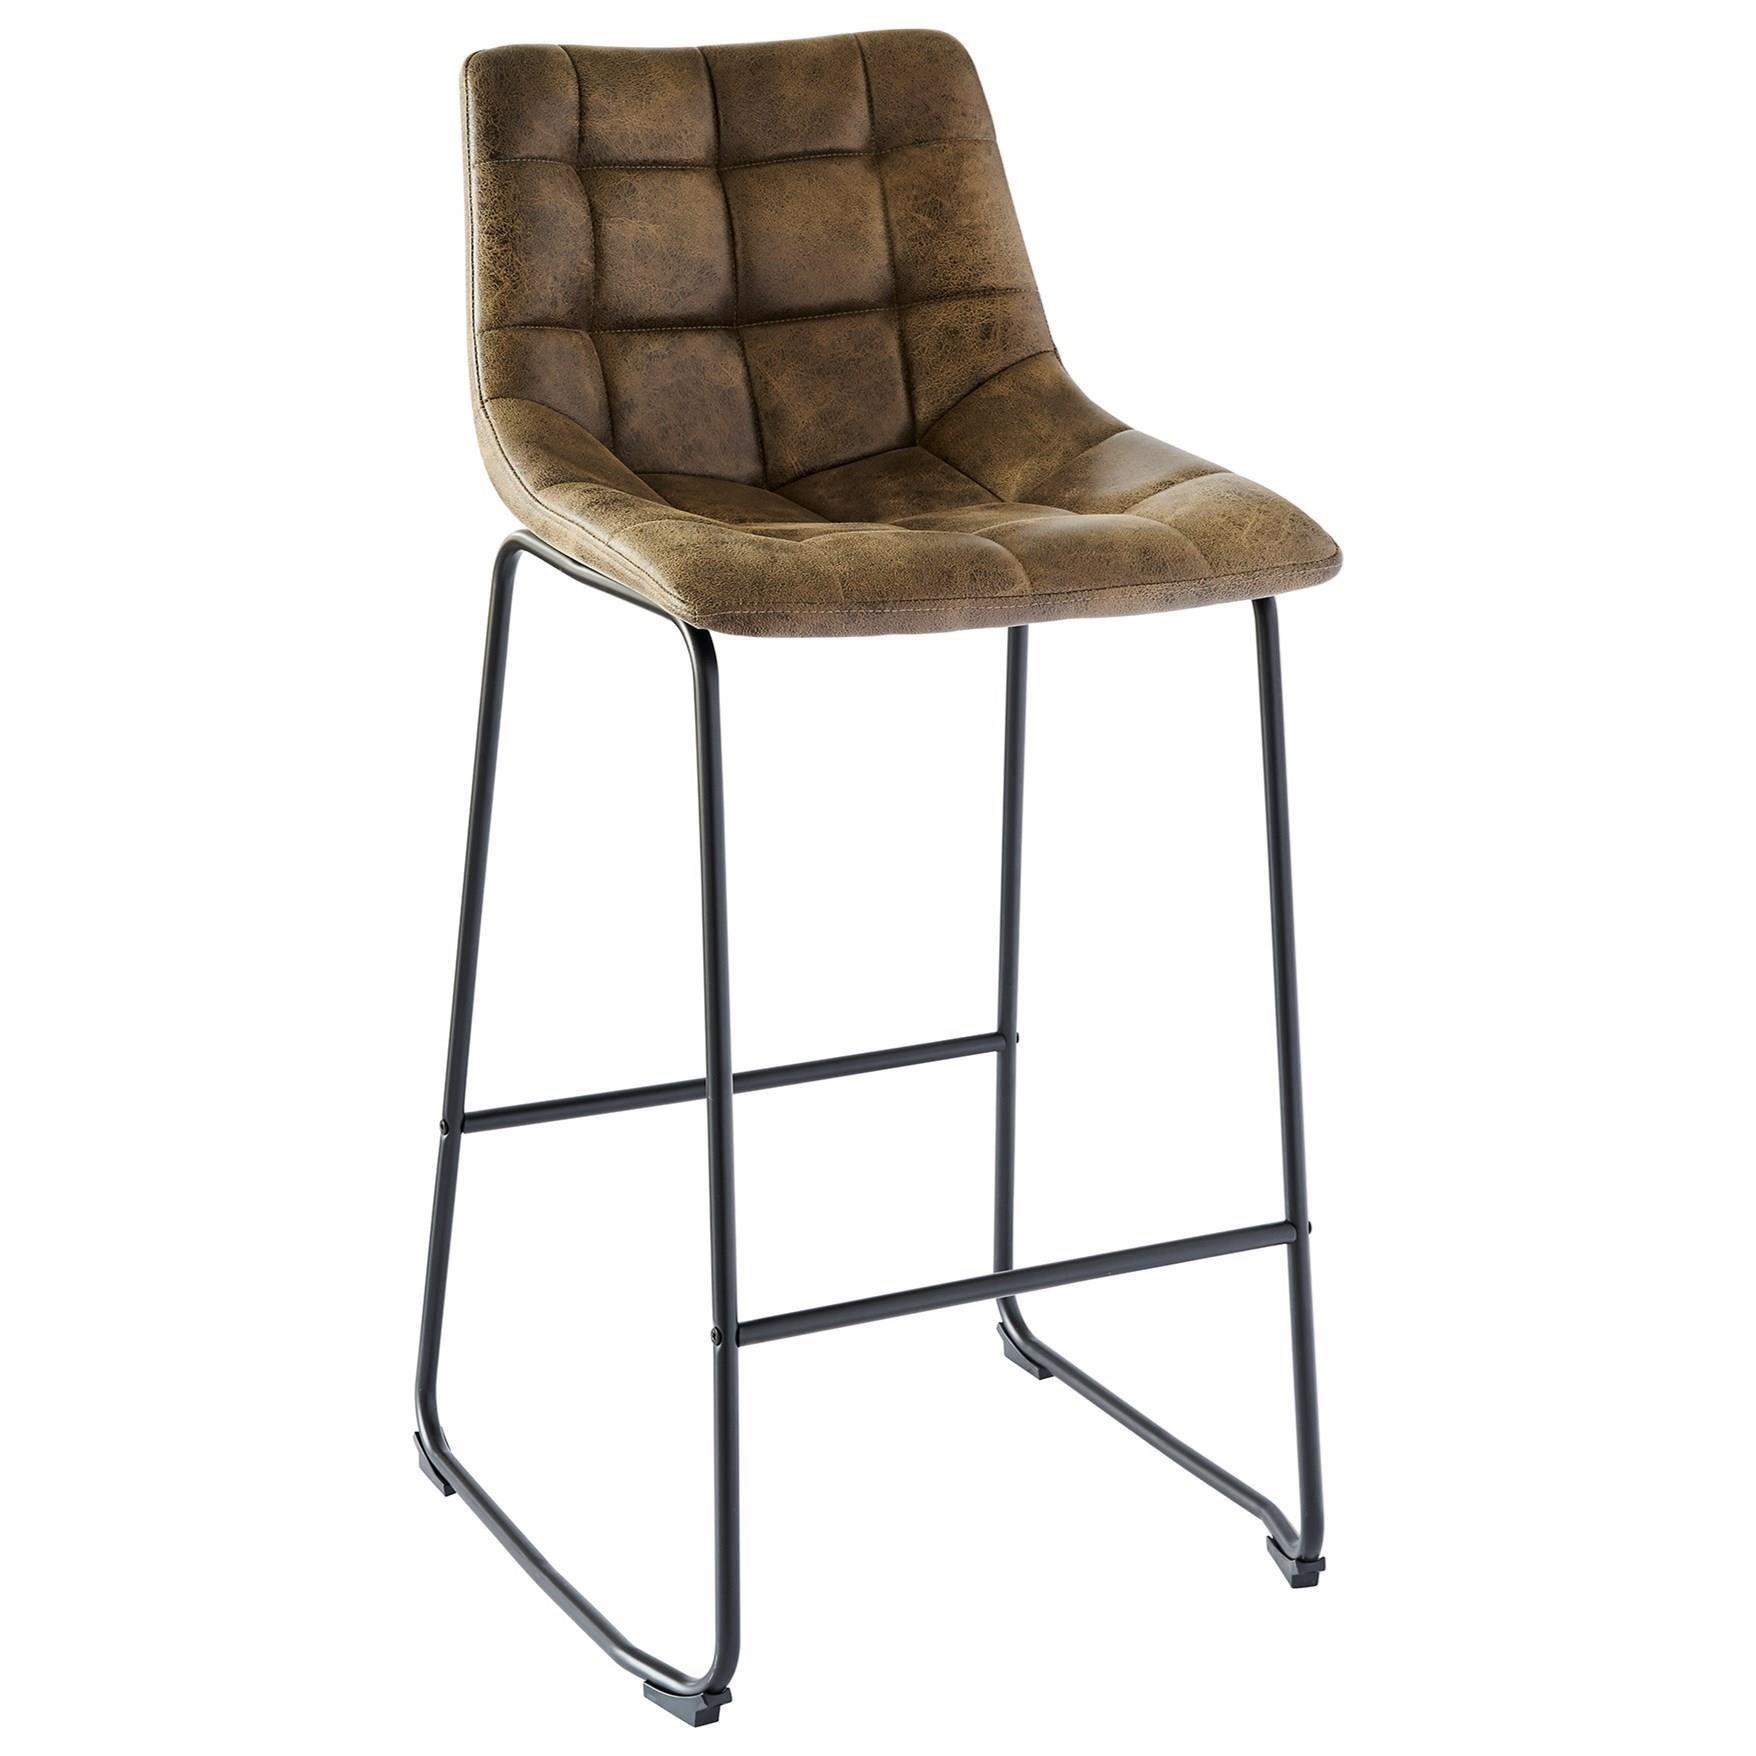 Seth Bar Stool by Elements International at Bullard Furniture